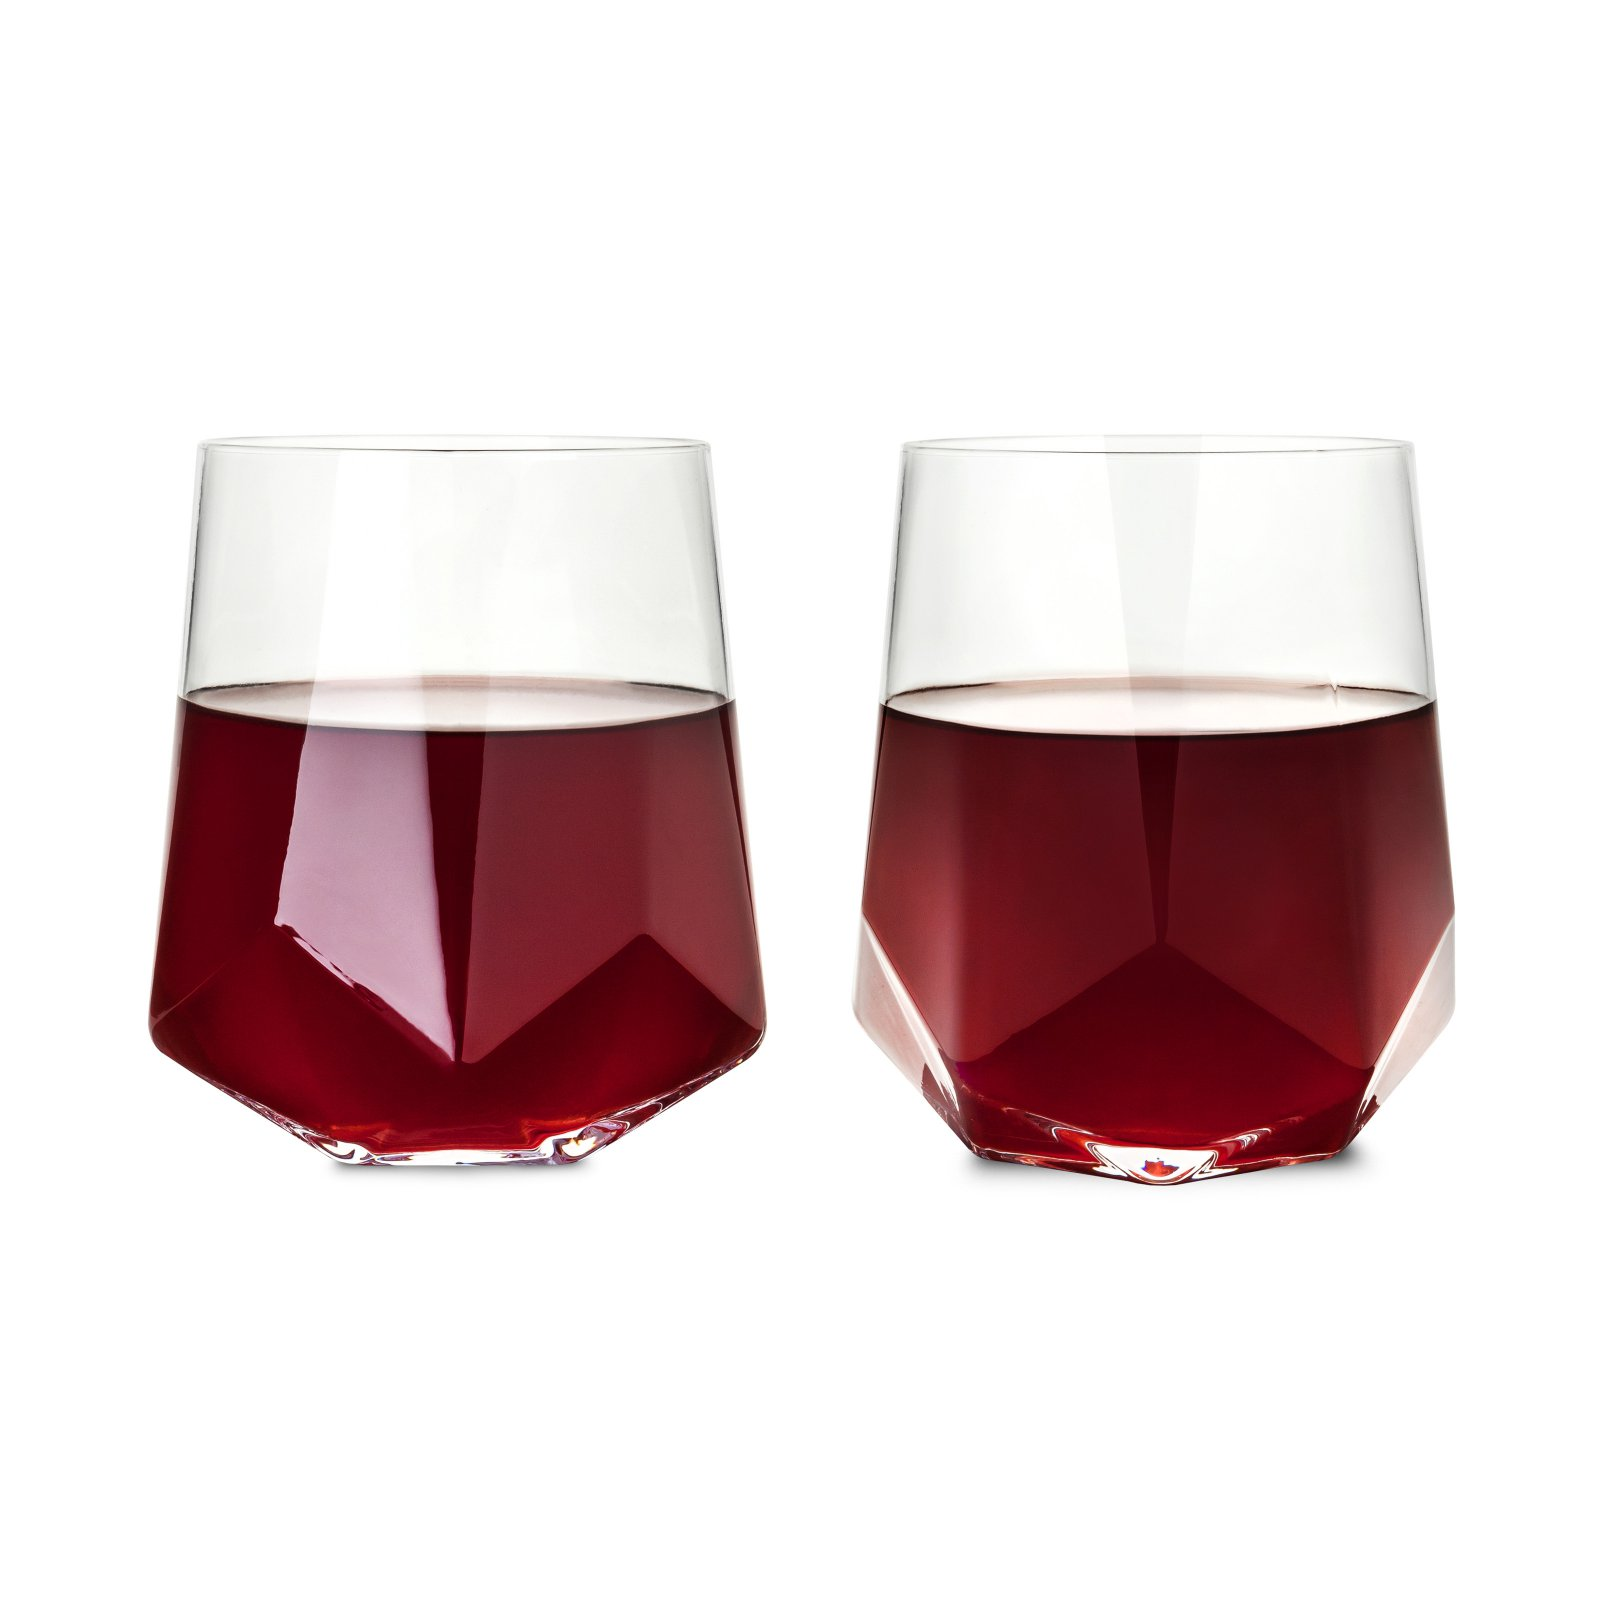 Viski Raye Faceted Crystal Wine Glass Set Of 2 In 2020 Crystal Wine Glasses Wine Glass Set Wine Glass